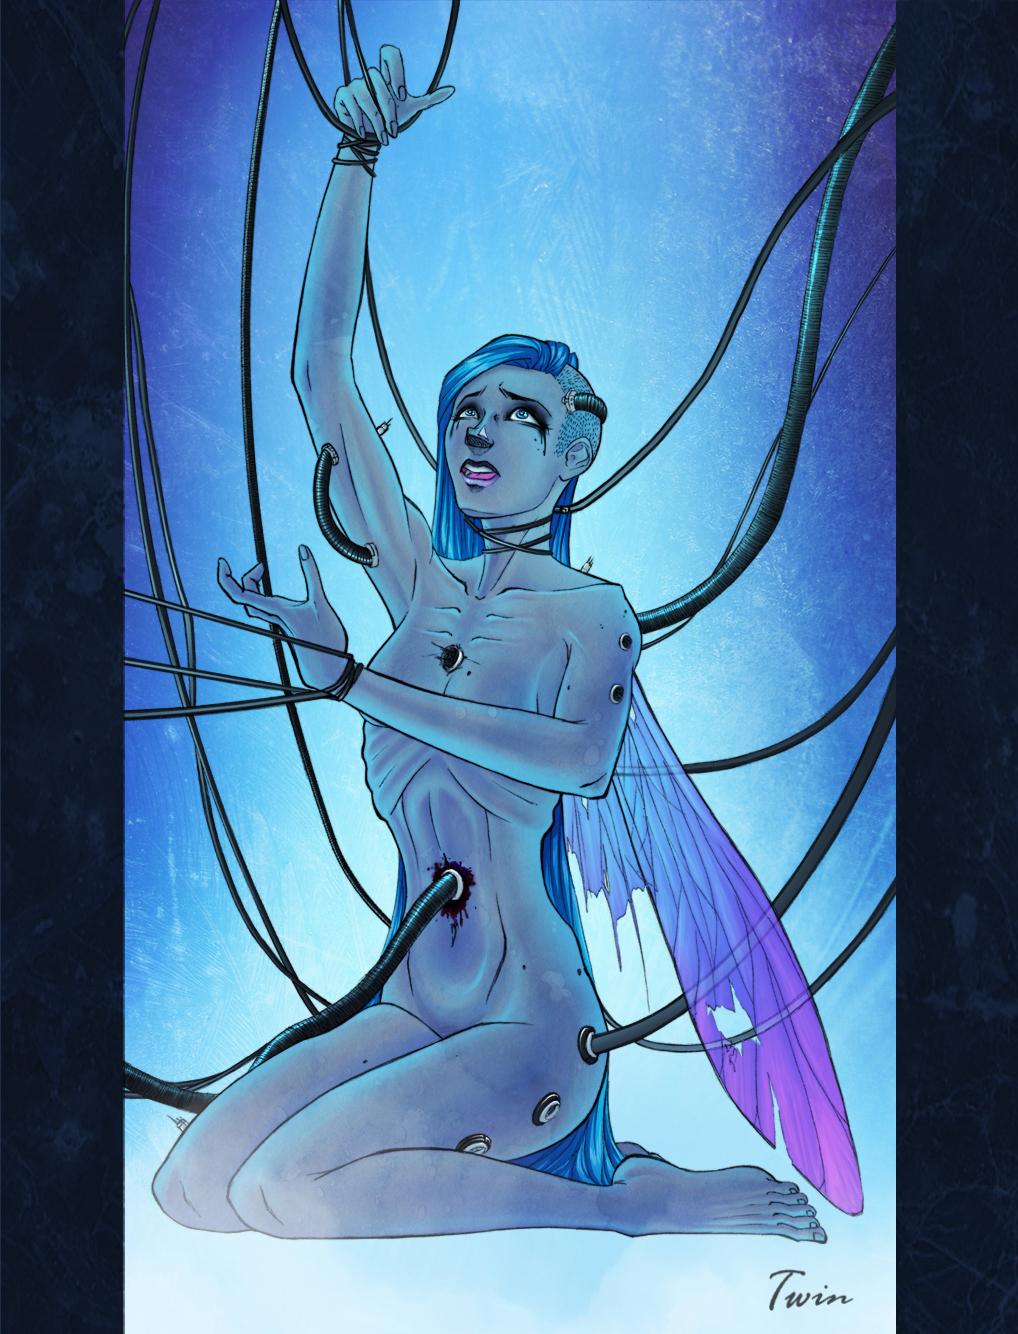 Vivisection of fairytale